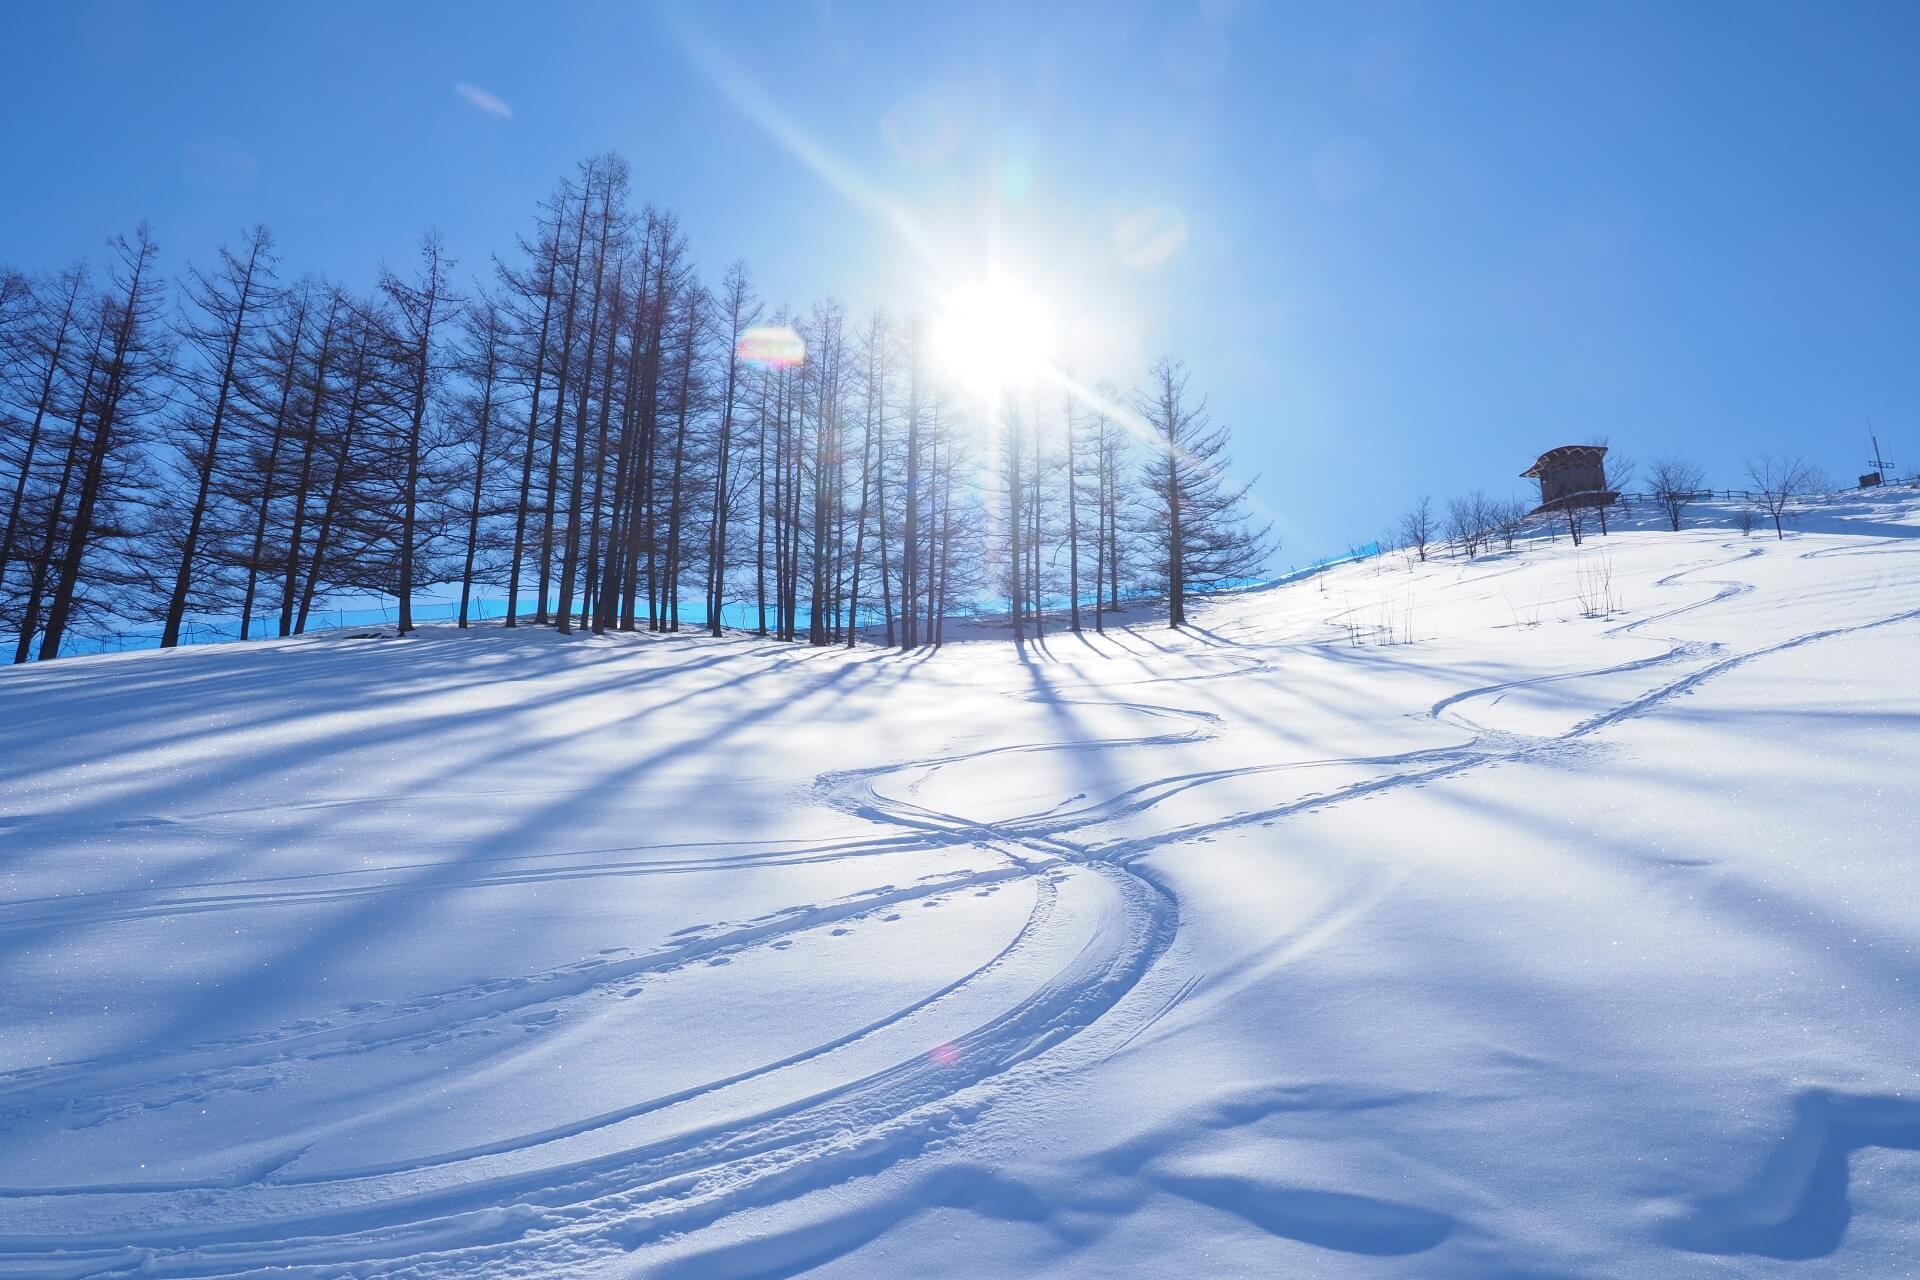 栃木県障害者スキー協会